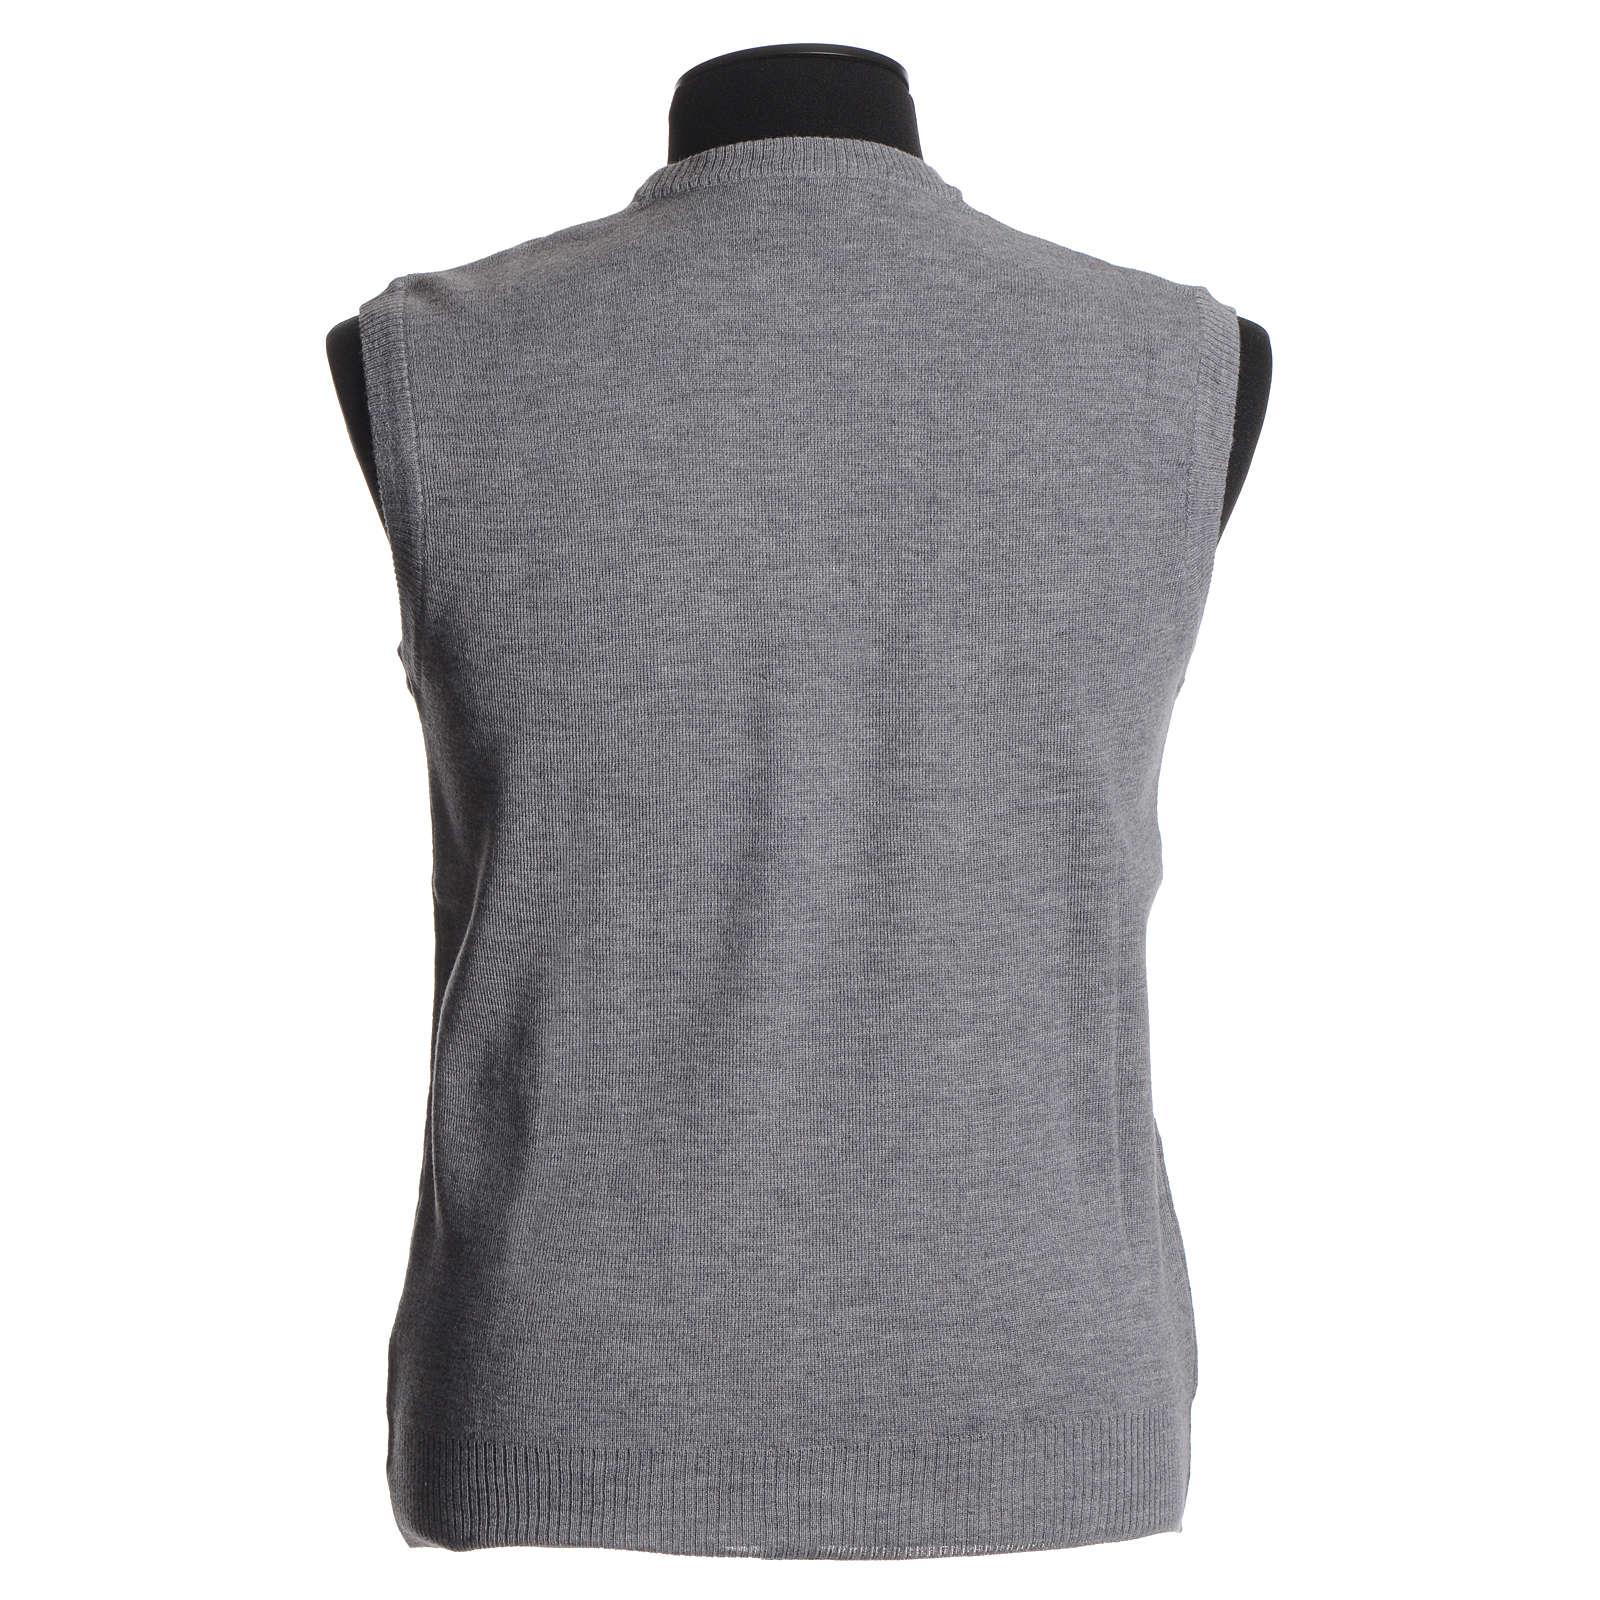 Crew-neck sleeveless cardigan, pale grey 4